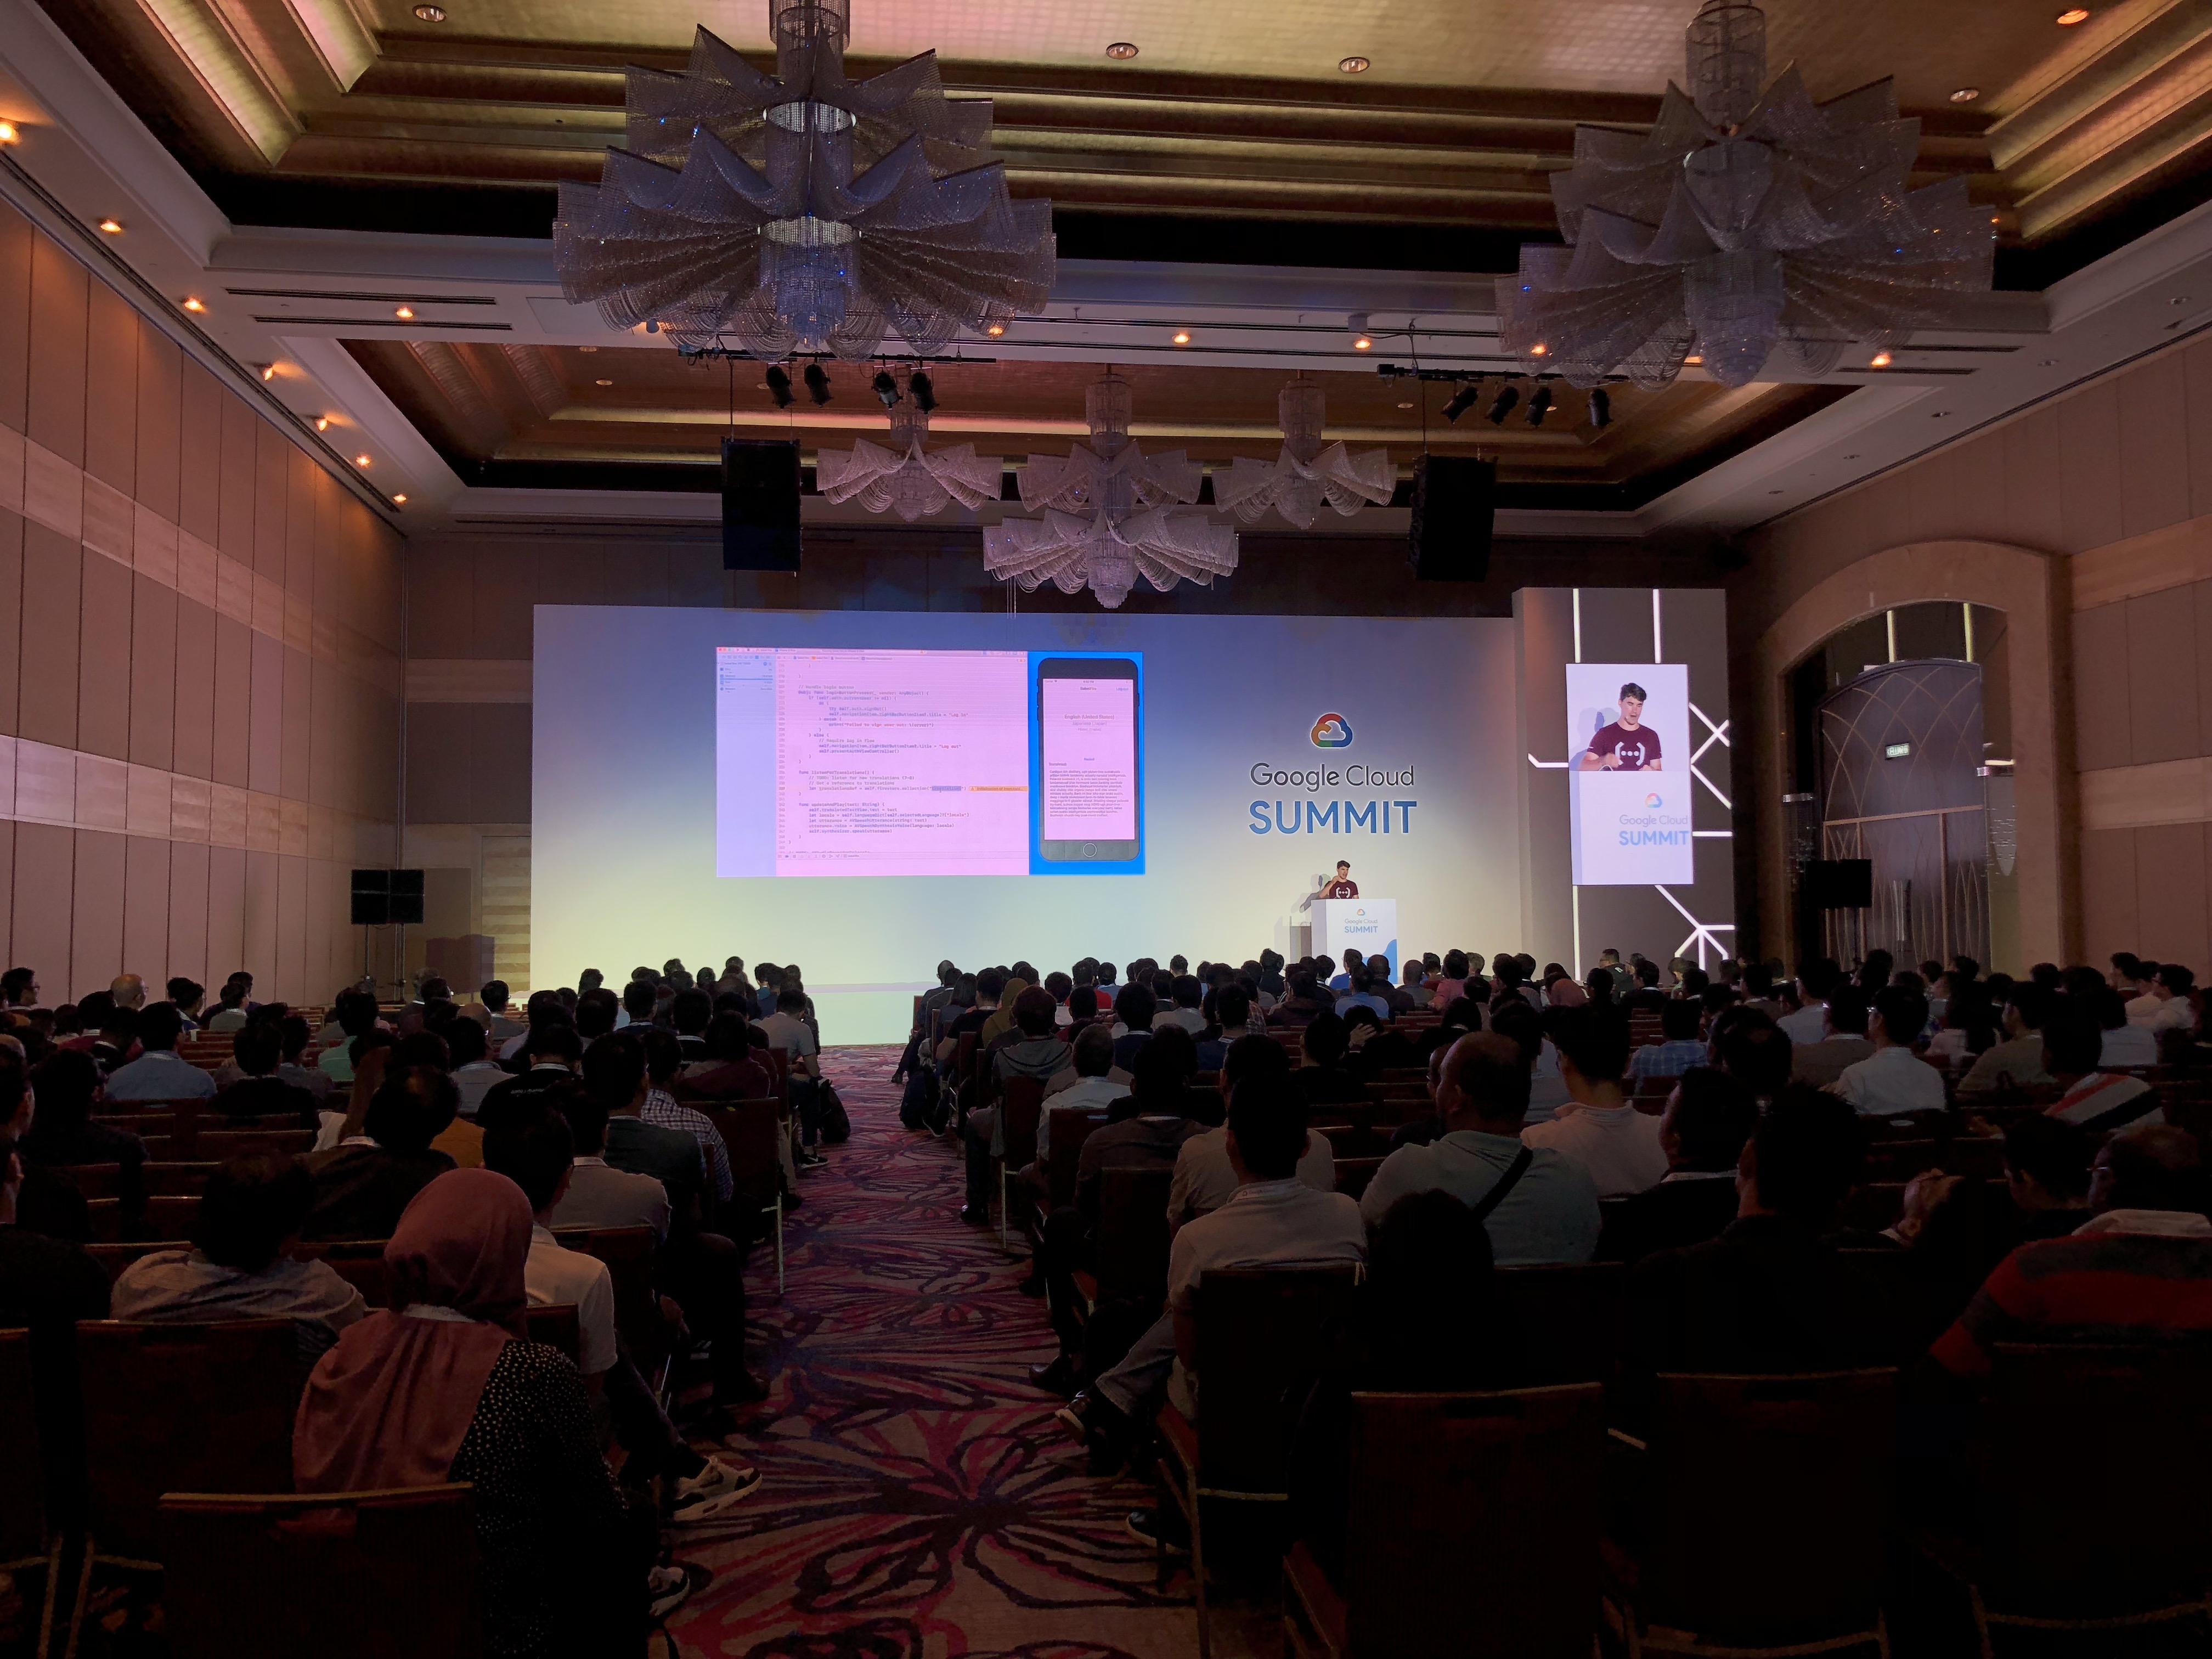 Google Cloud Summit Kuala Lumpur 6